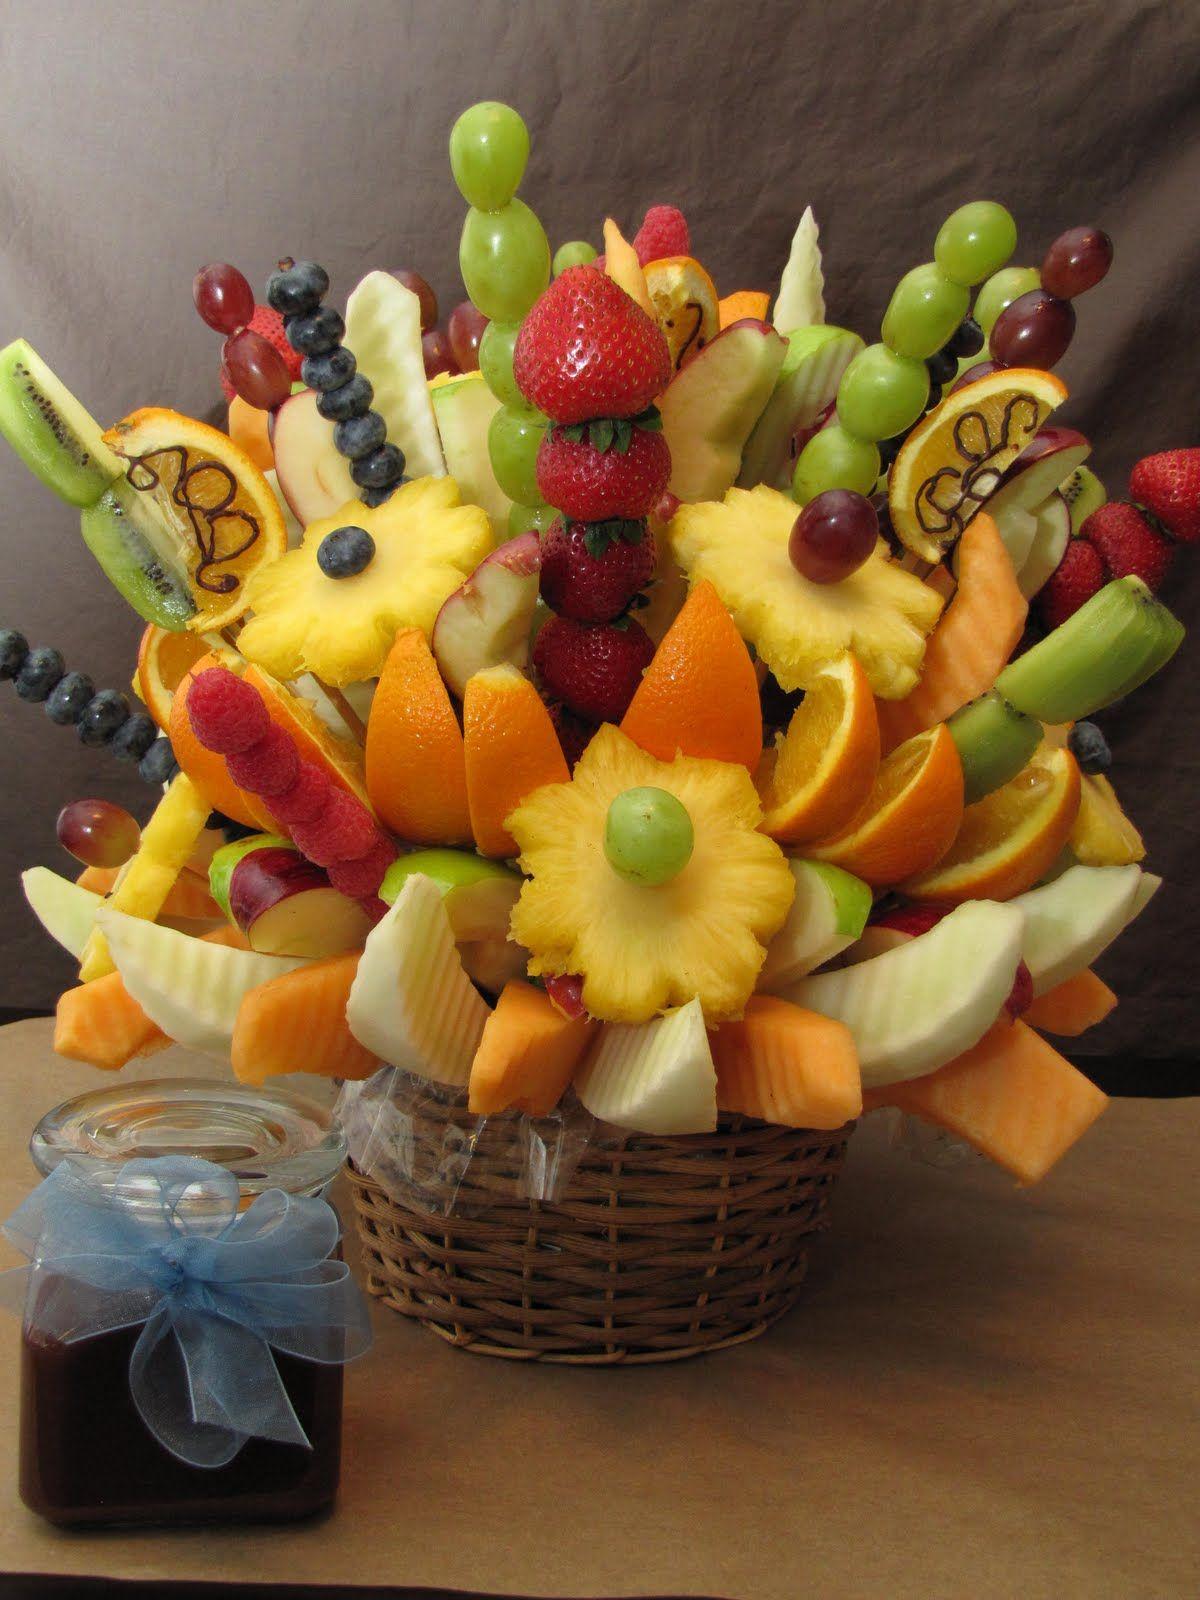 Fruit centrepieces instead of flowers wedding ideas pinterest fruit centrepieces instead of flowers fruit centerpieces fruit arrangements centrepieces food bouquet izmirmasajfo